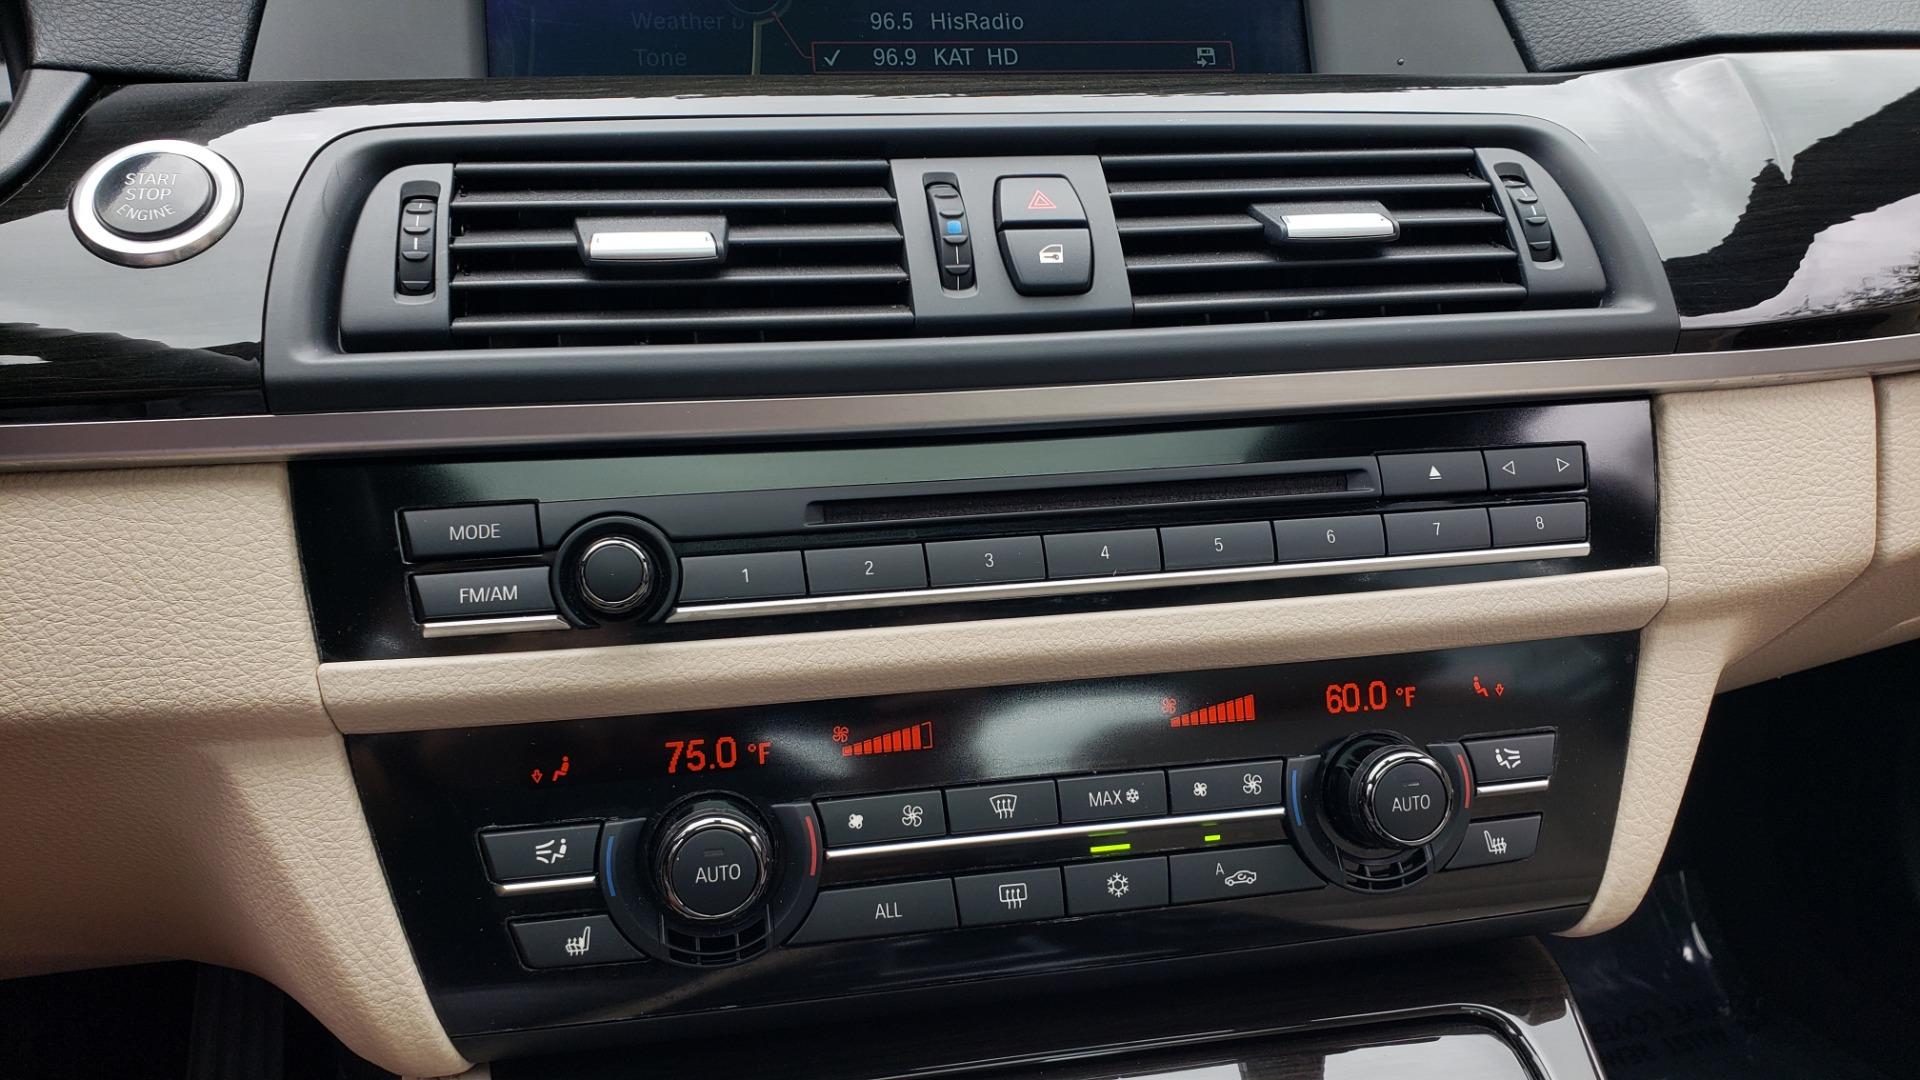 Used 2012 BMW 5 SERIES 550I M SPORT / NAV / CONV PKG / SUNROOF / PREM SND / REARVIEW for sale Sold at Formula Imports in Charlotte NC 28227 38